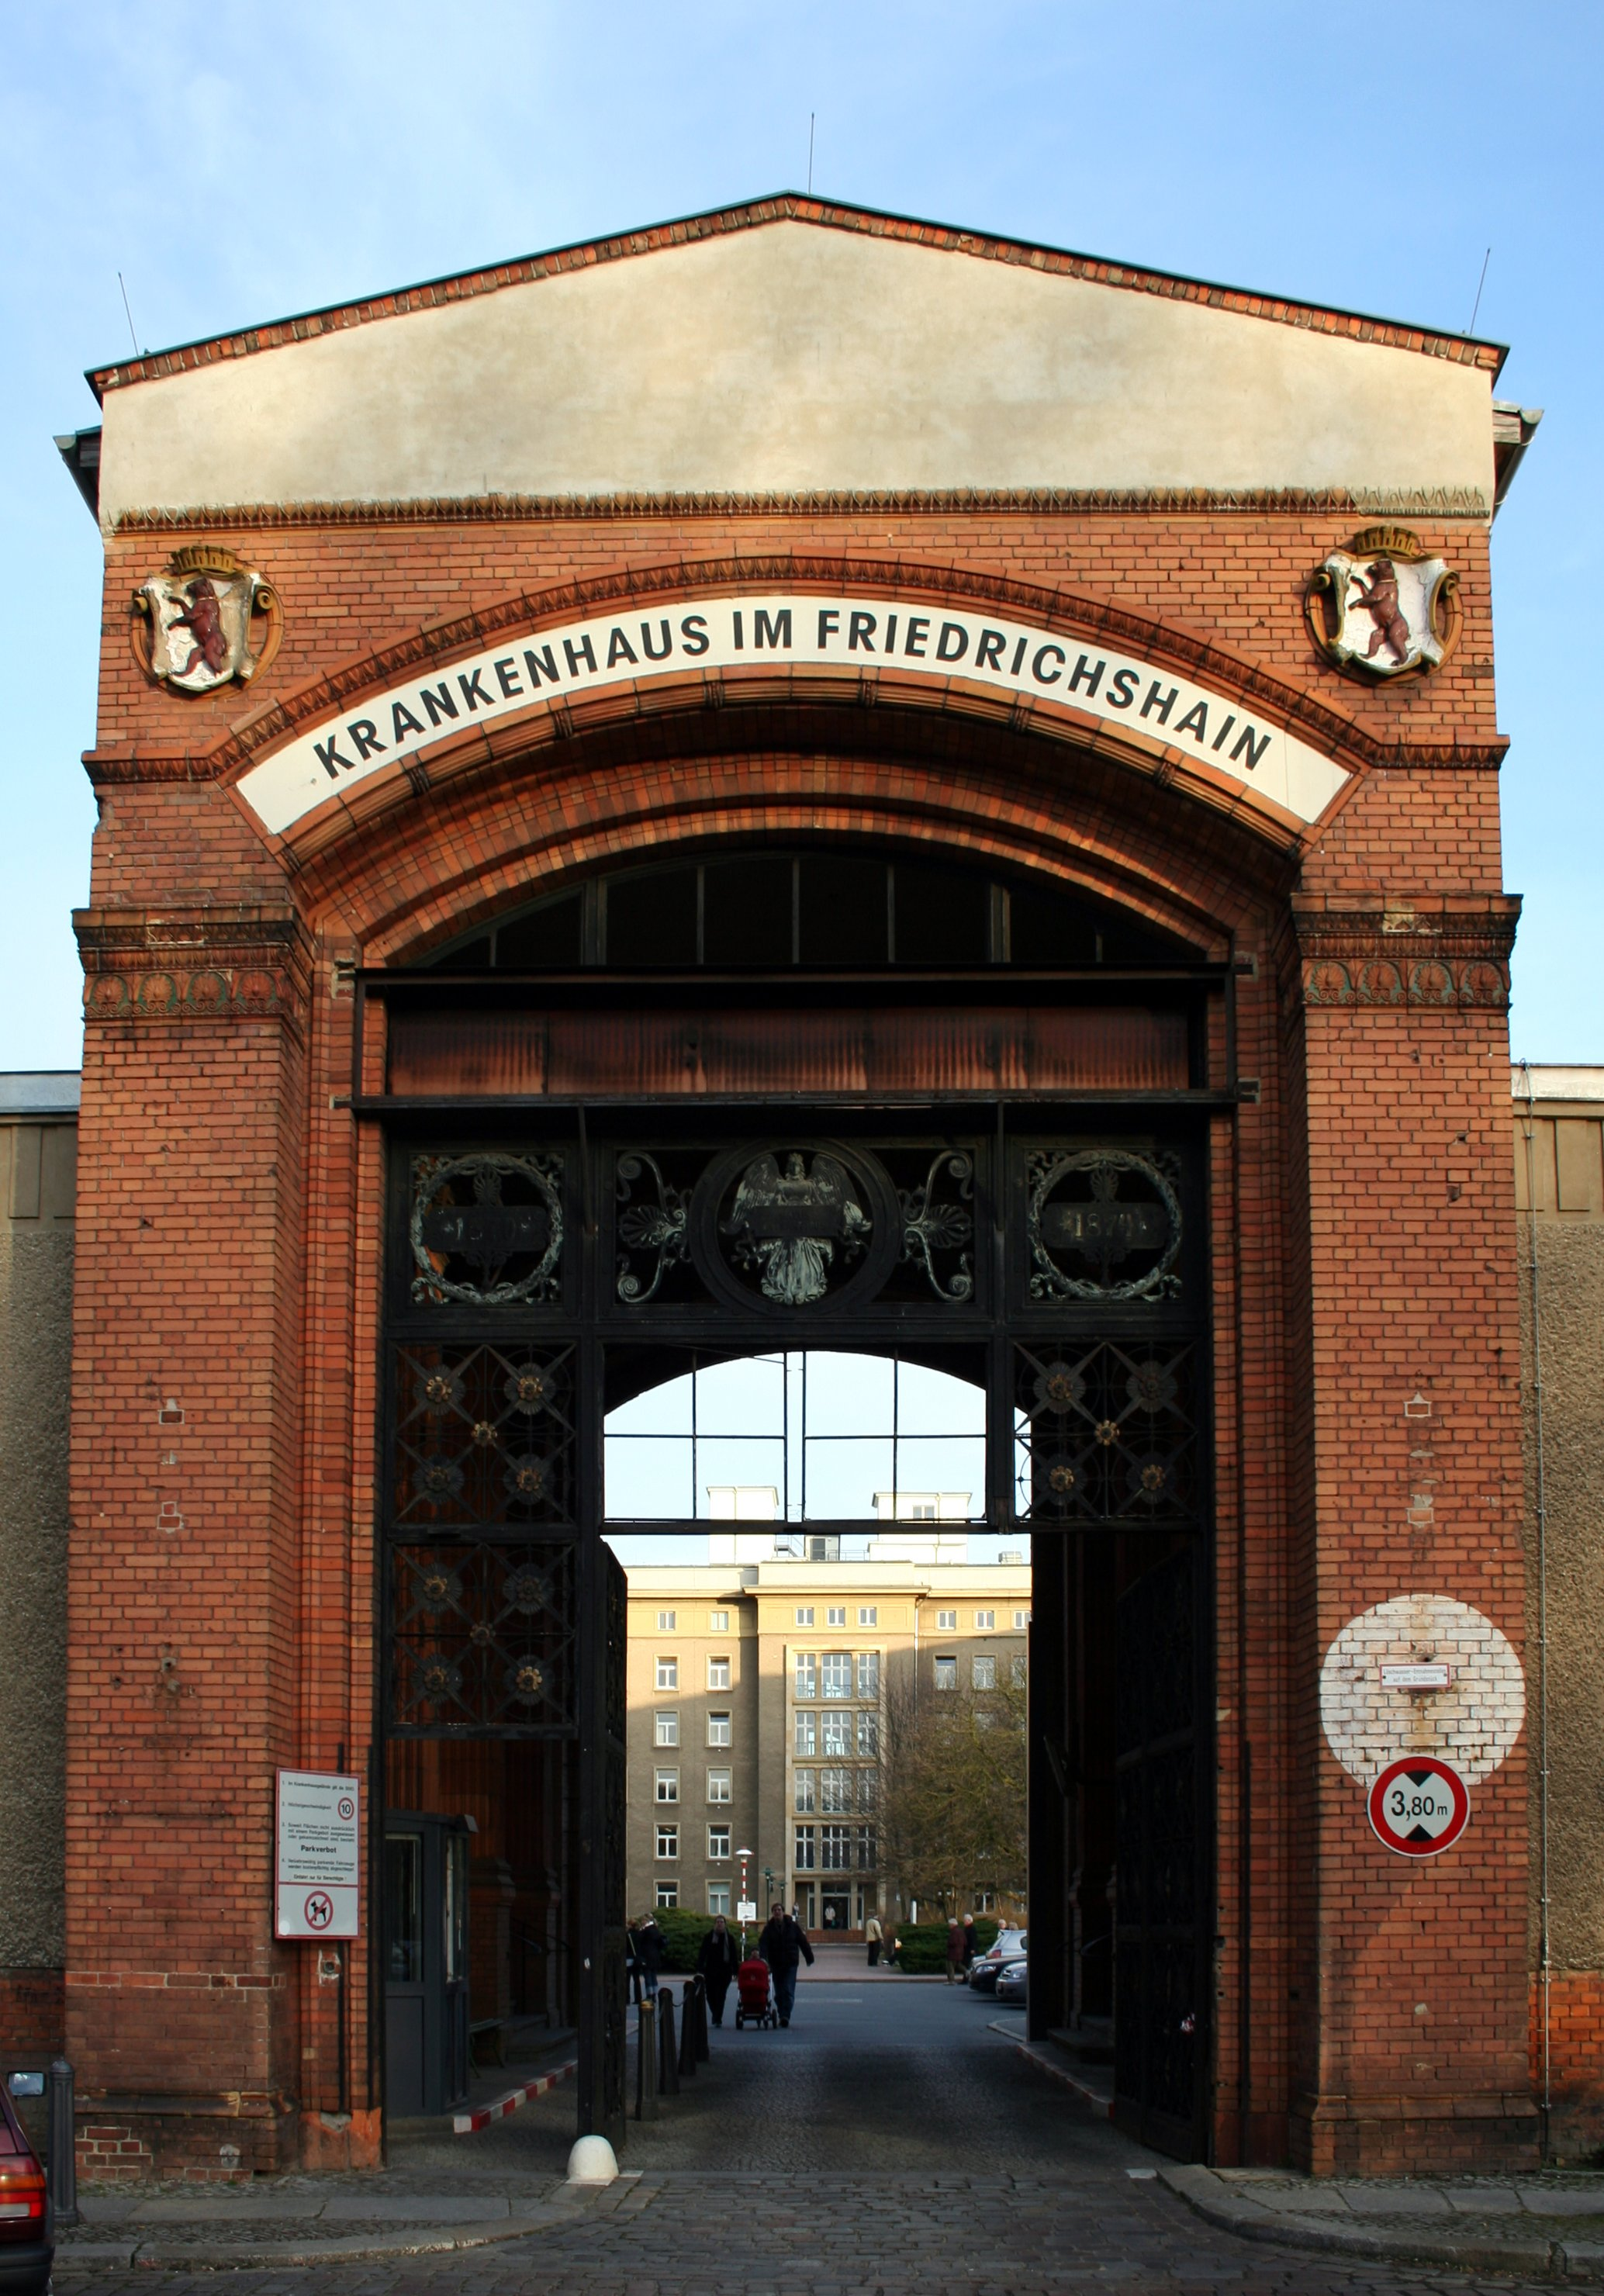 Gate to the hospital built around 1870 | © Maria Krüger/WikiCommons